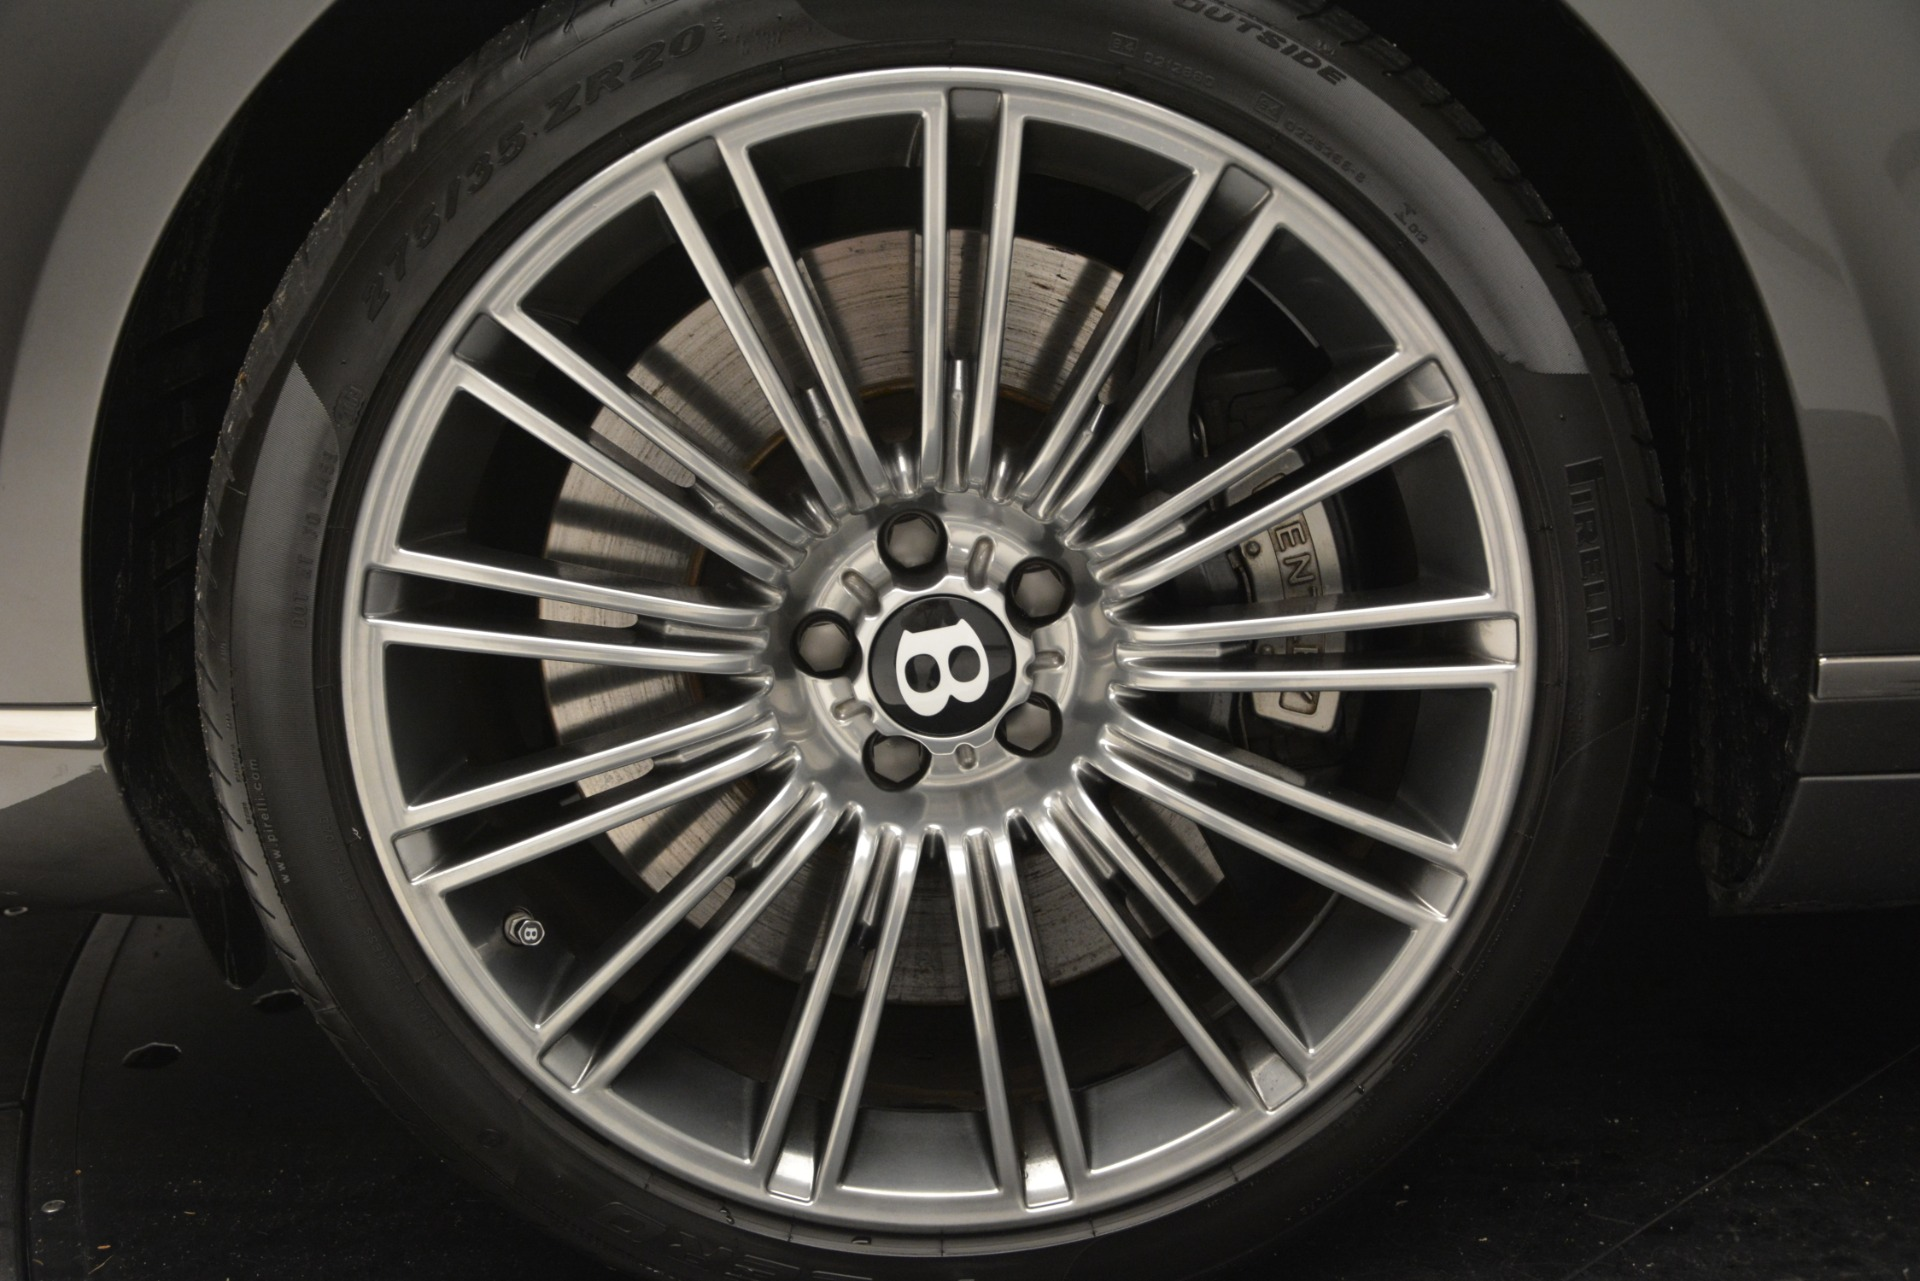 Used 2010 Bentley Continental GT Speed For Sale In Westport, CT 2677_p19